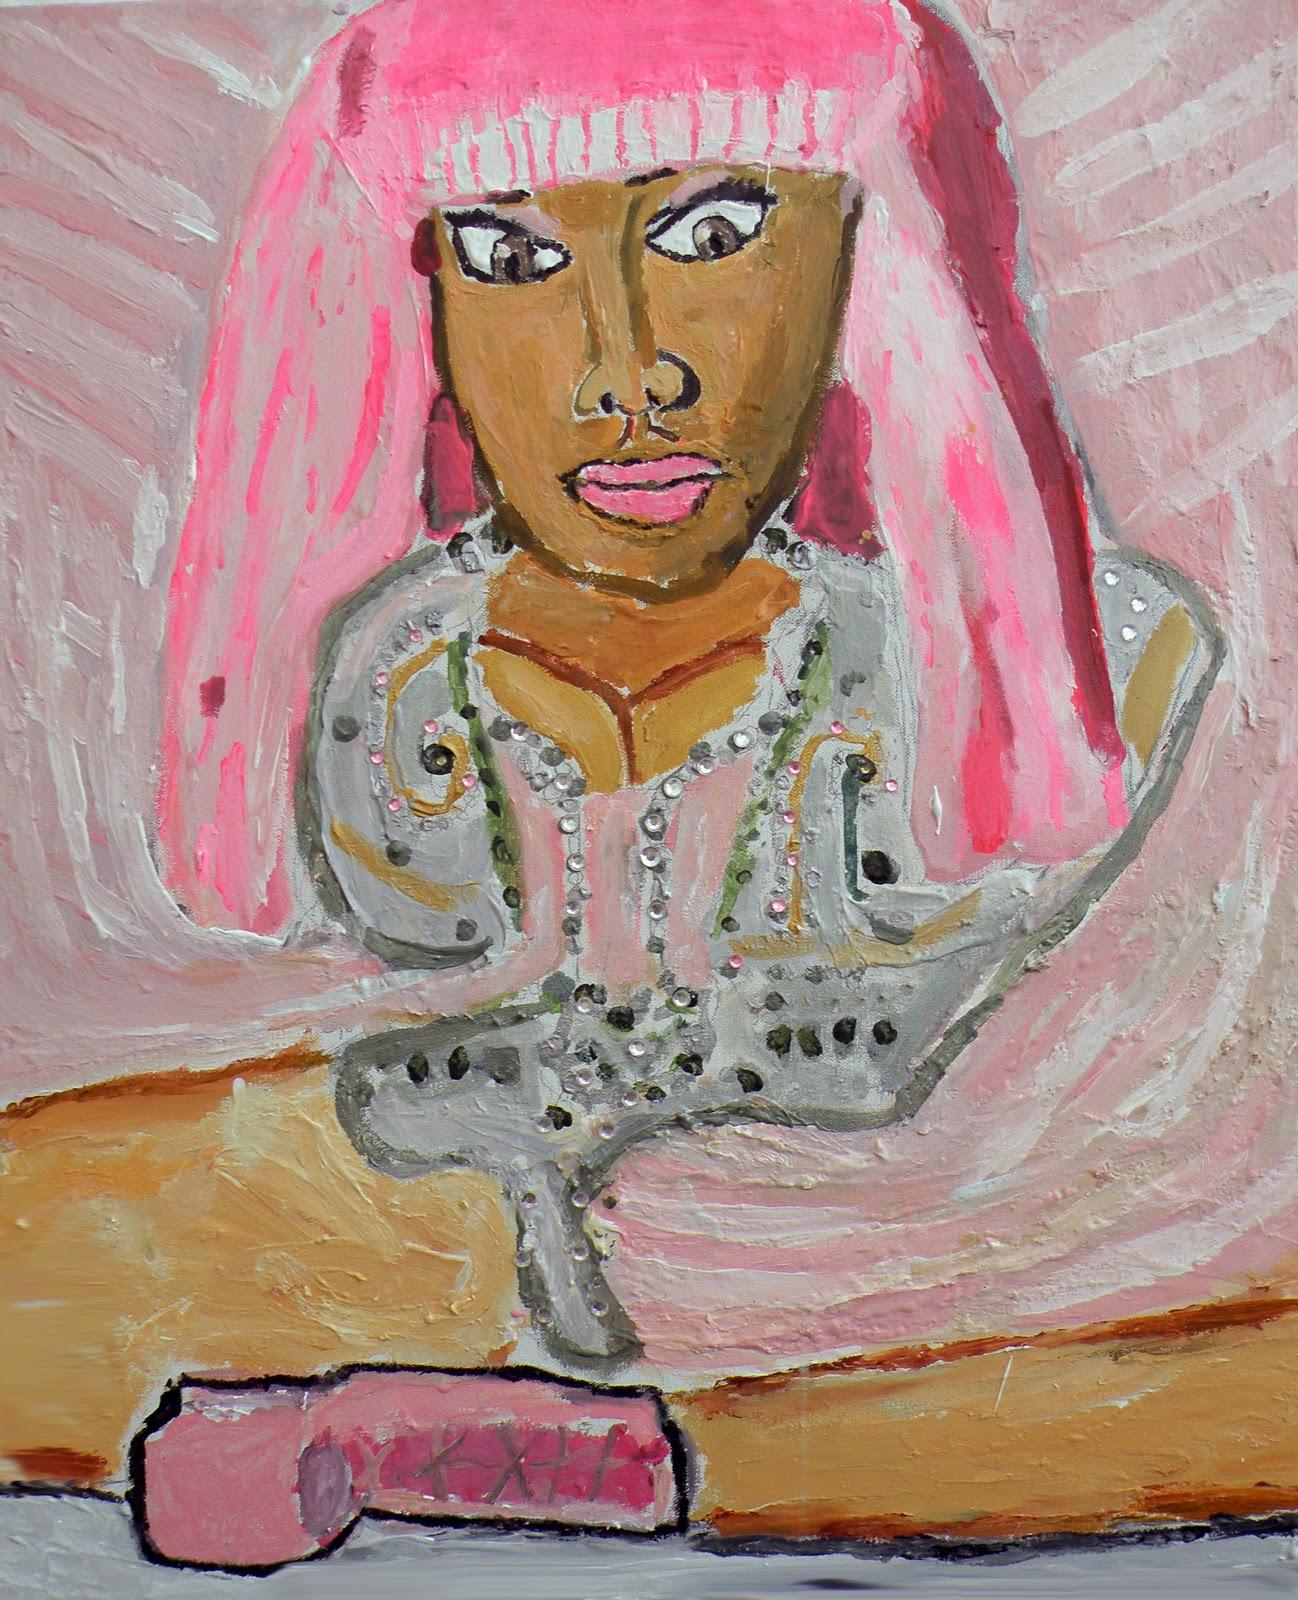 http://4.bp.blogspot.com/-lsKghpIdfww/TZ3vX_4cd2I/AAAAAAAAABg/M65Xe7eDJMA/s1600/nicki+menaj.jpg